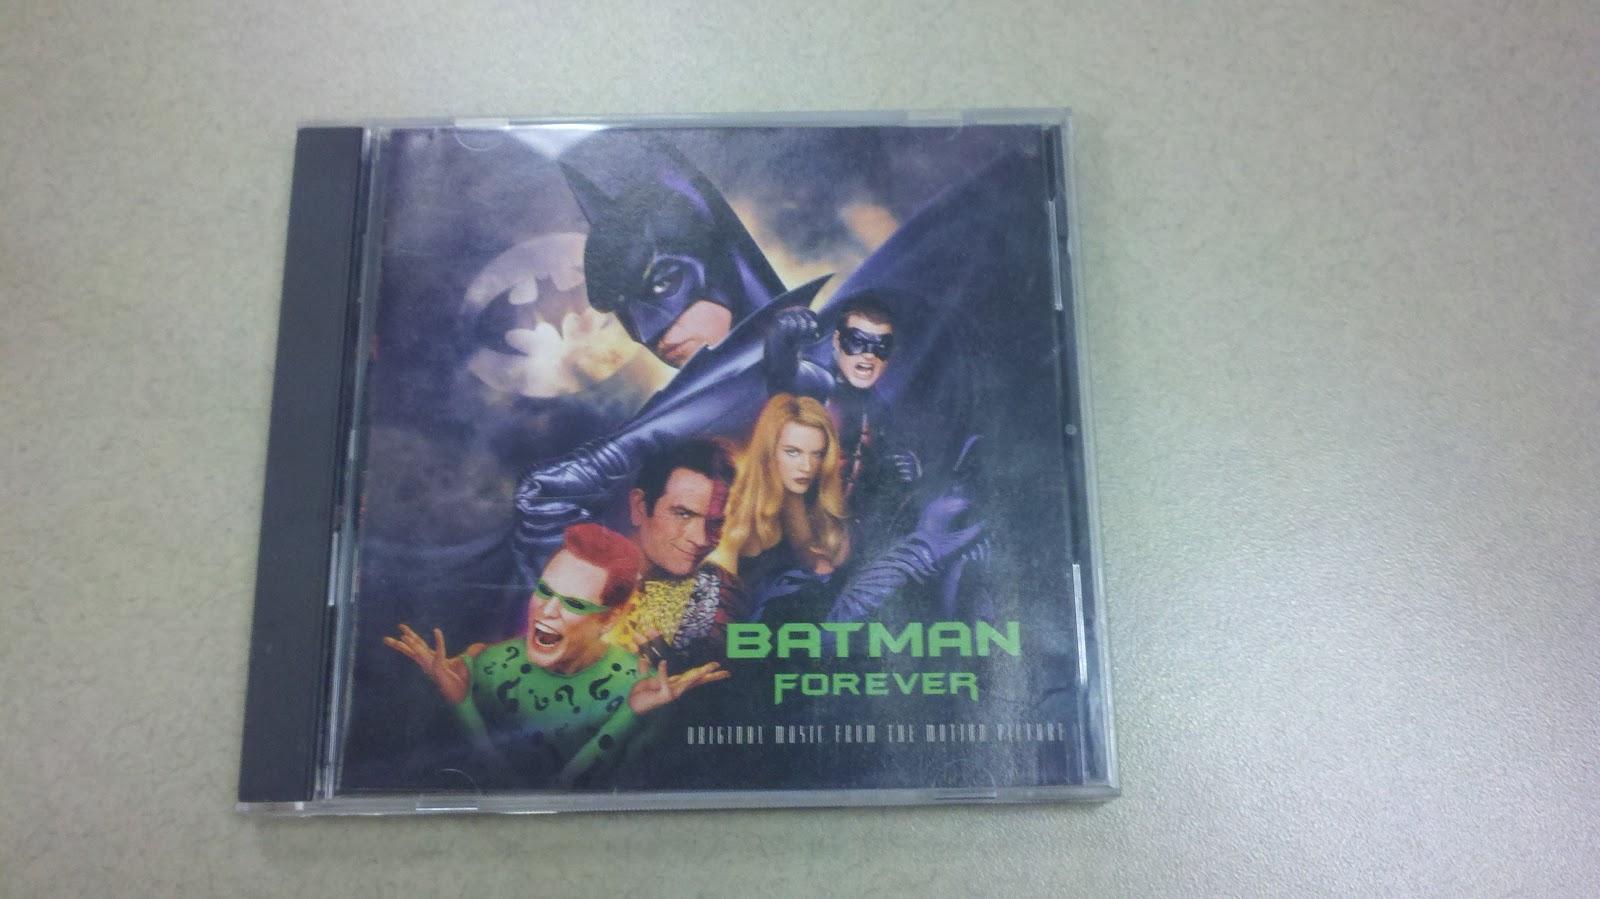 Movie MoJoe: Soundtrack To My Life: Batman Forever